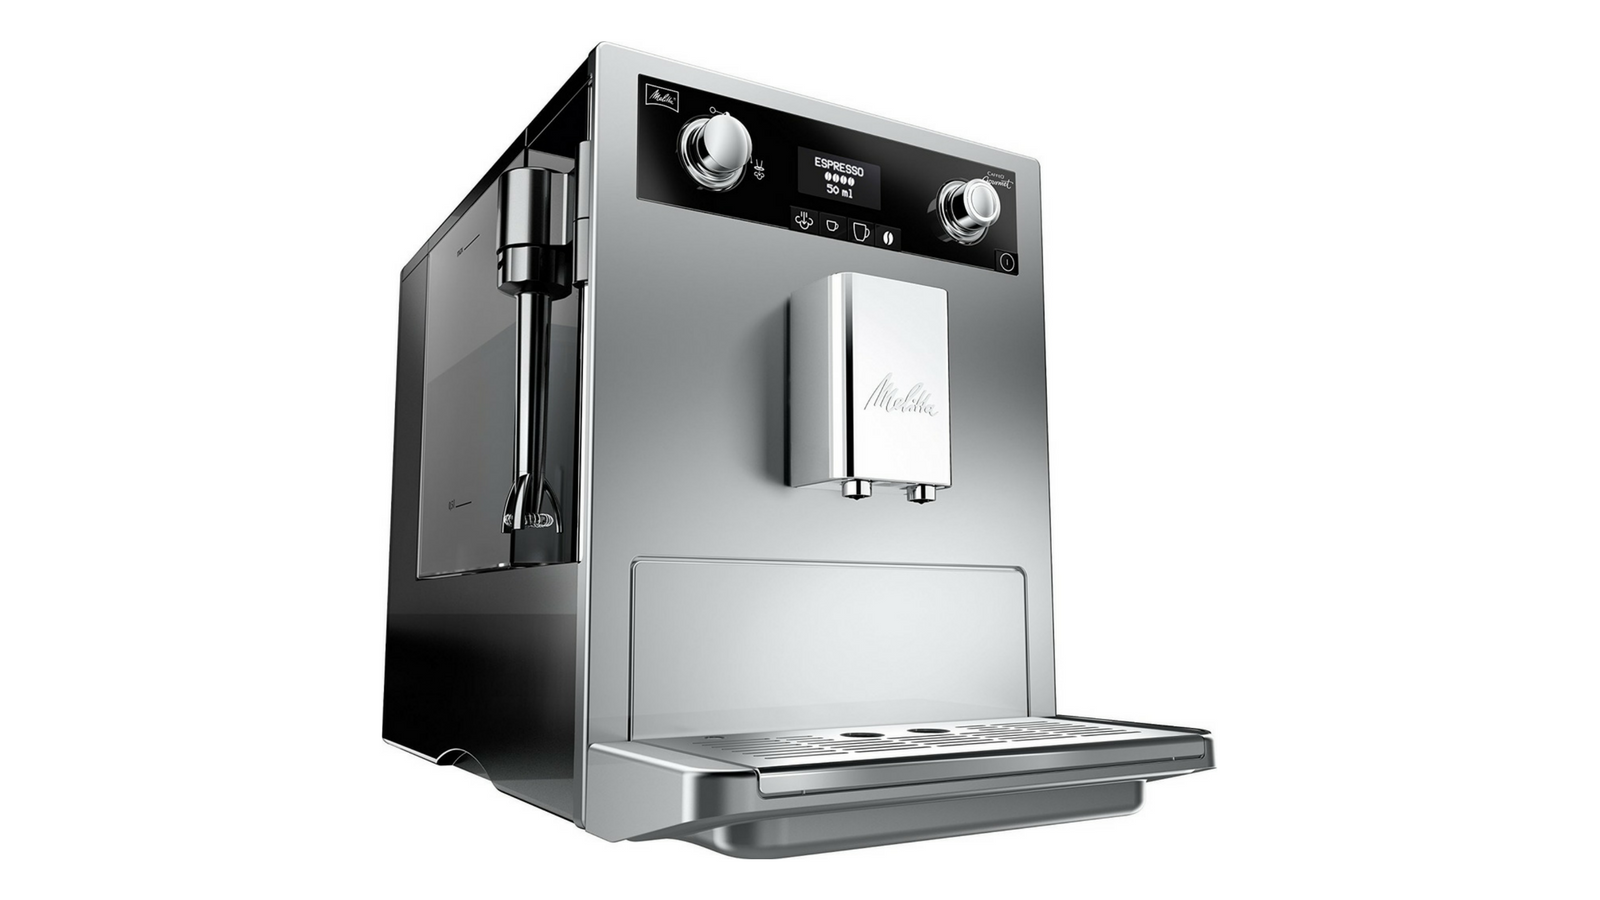 Bosch dishwasher black friday deals 2018